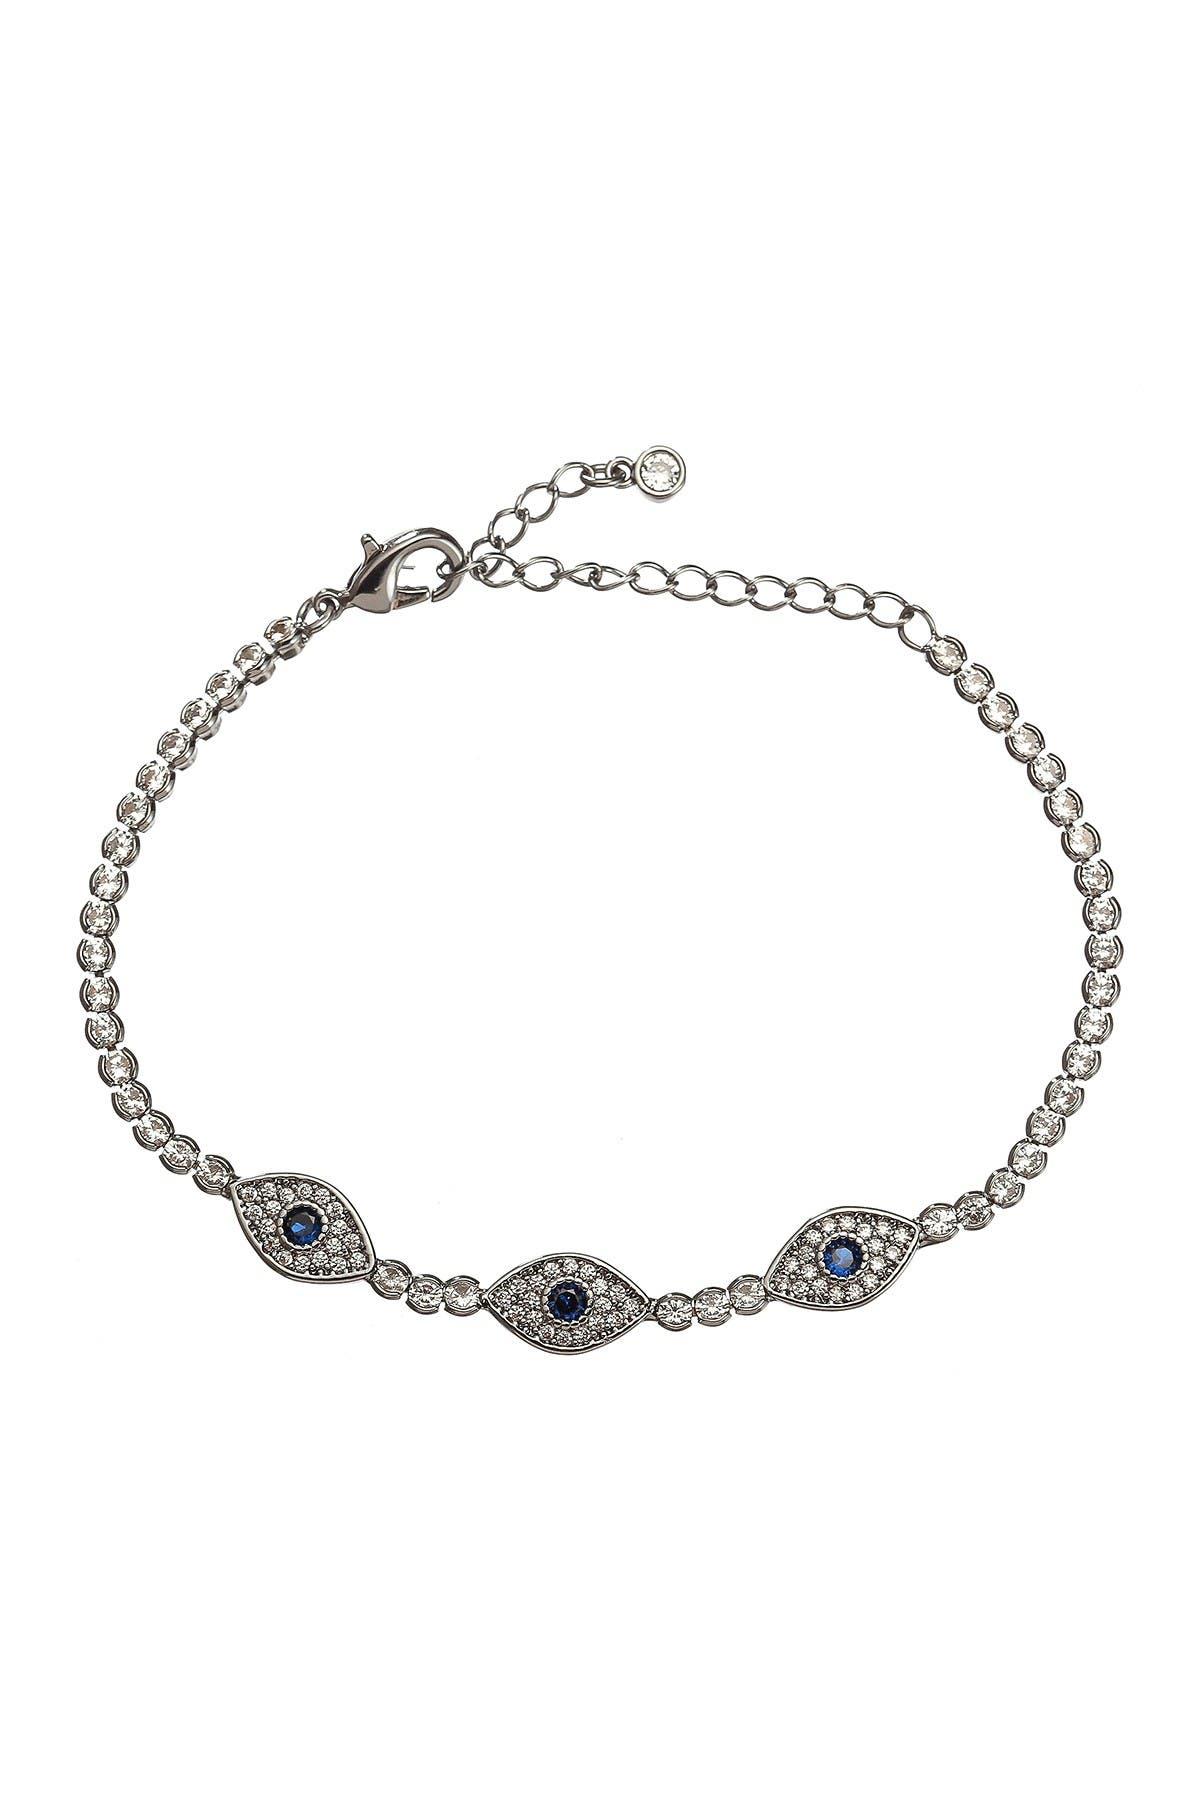 Image of Eye Candy Los Angeles Sami Silver Triple Evil Eye CZ Crystal Charm Bracelet